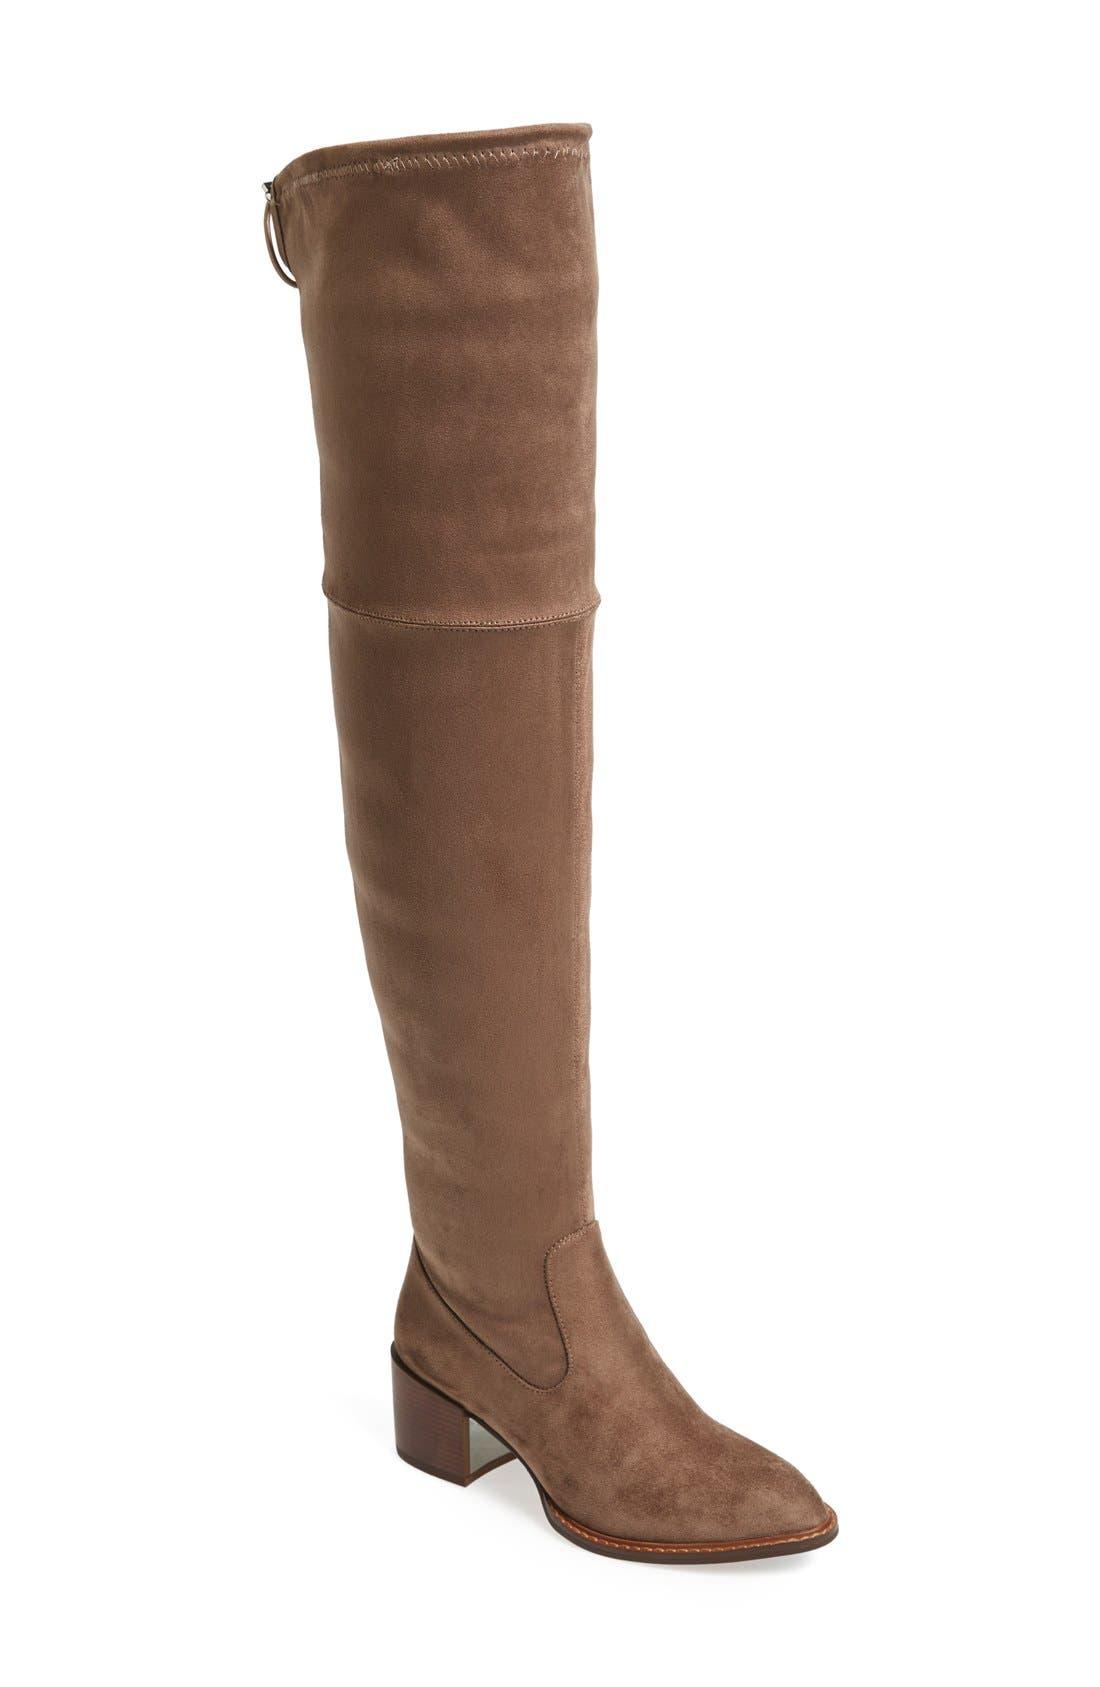 Alternate Image 1 Selected - BCBGeneration 'Sawyar' Over the Knee Boot (Women)